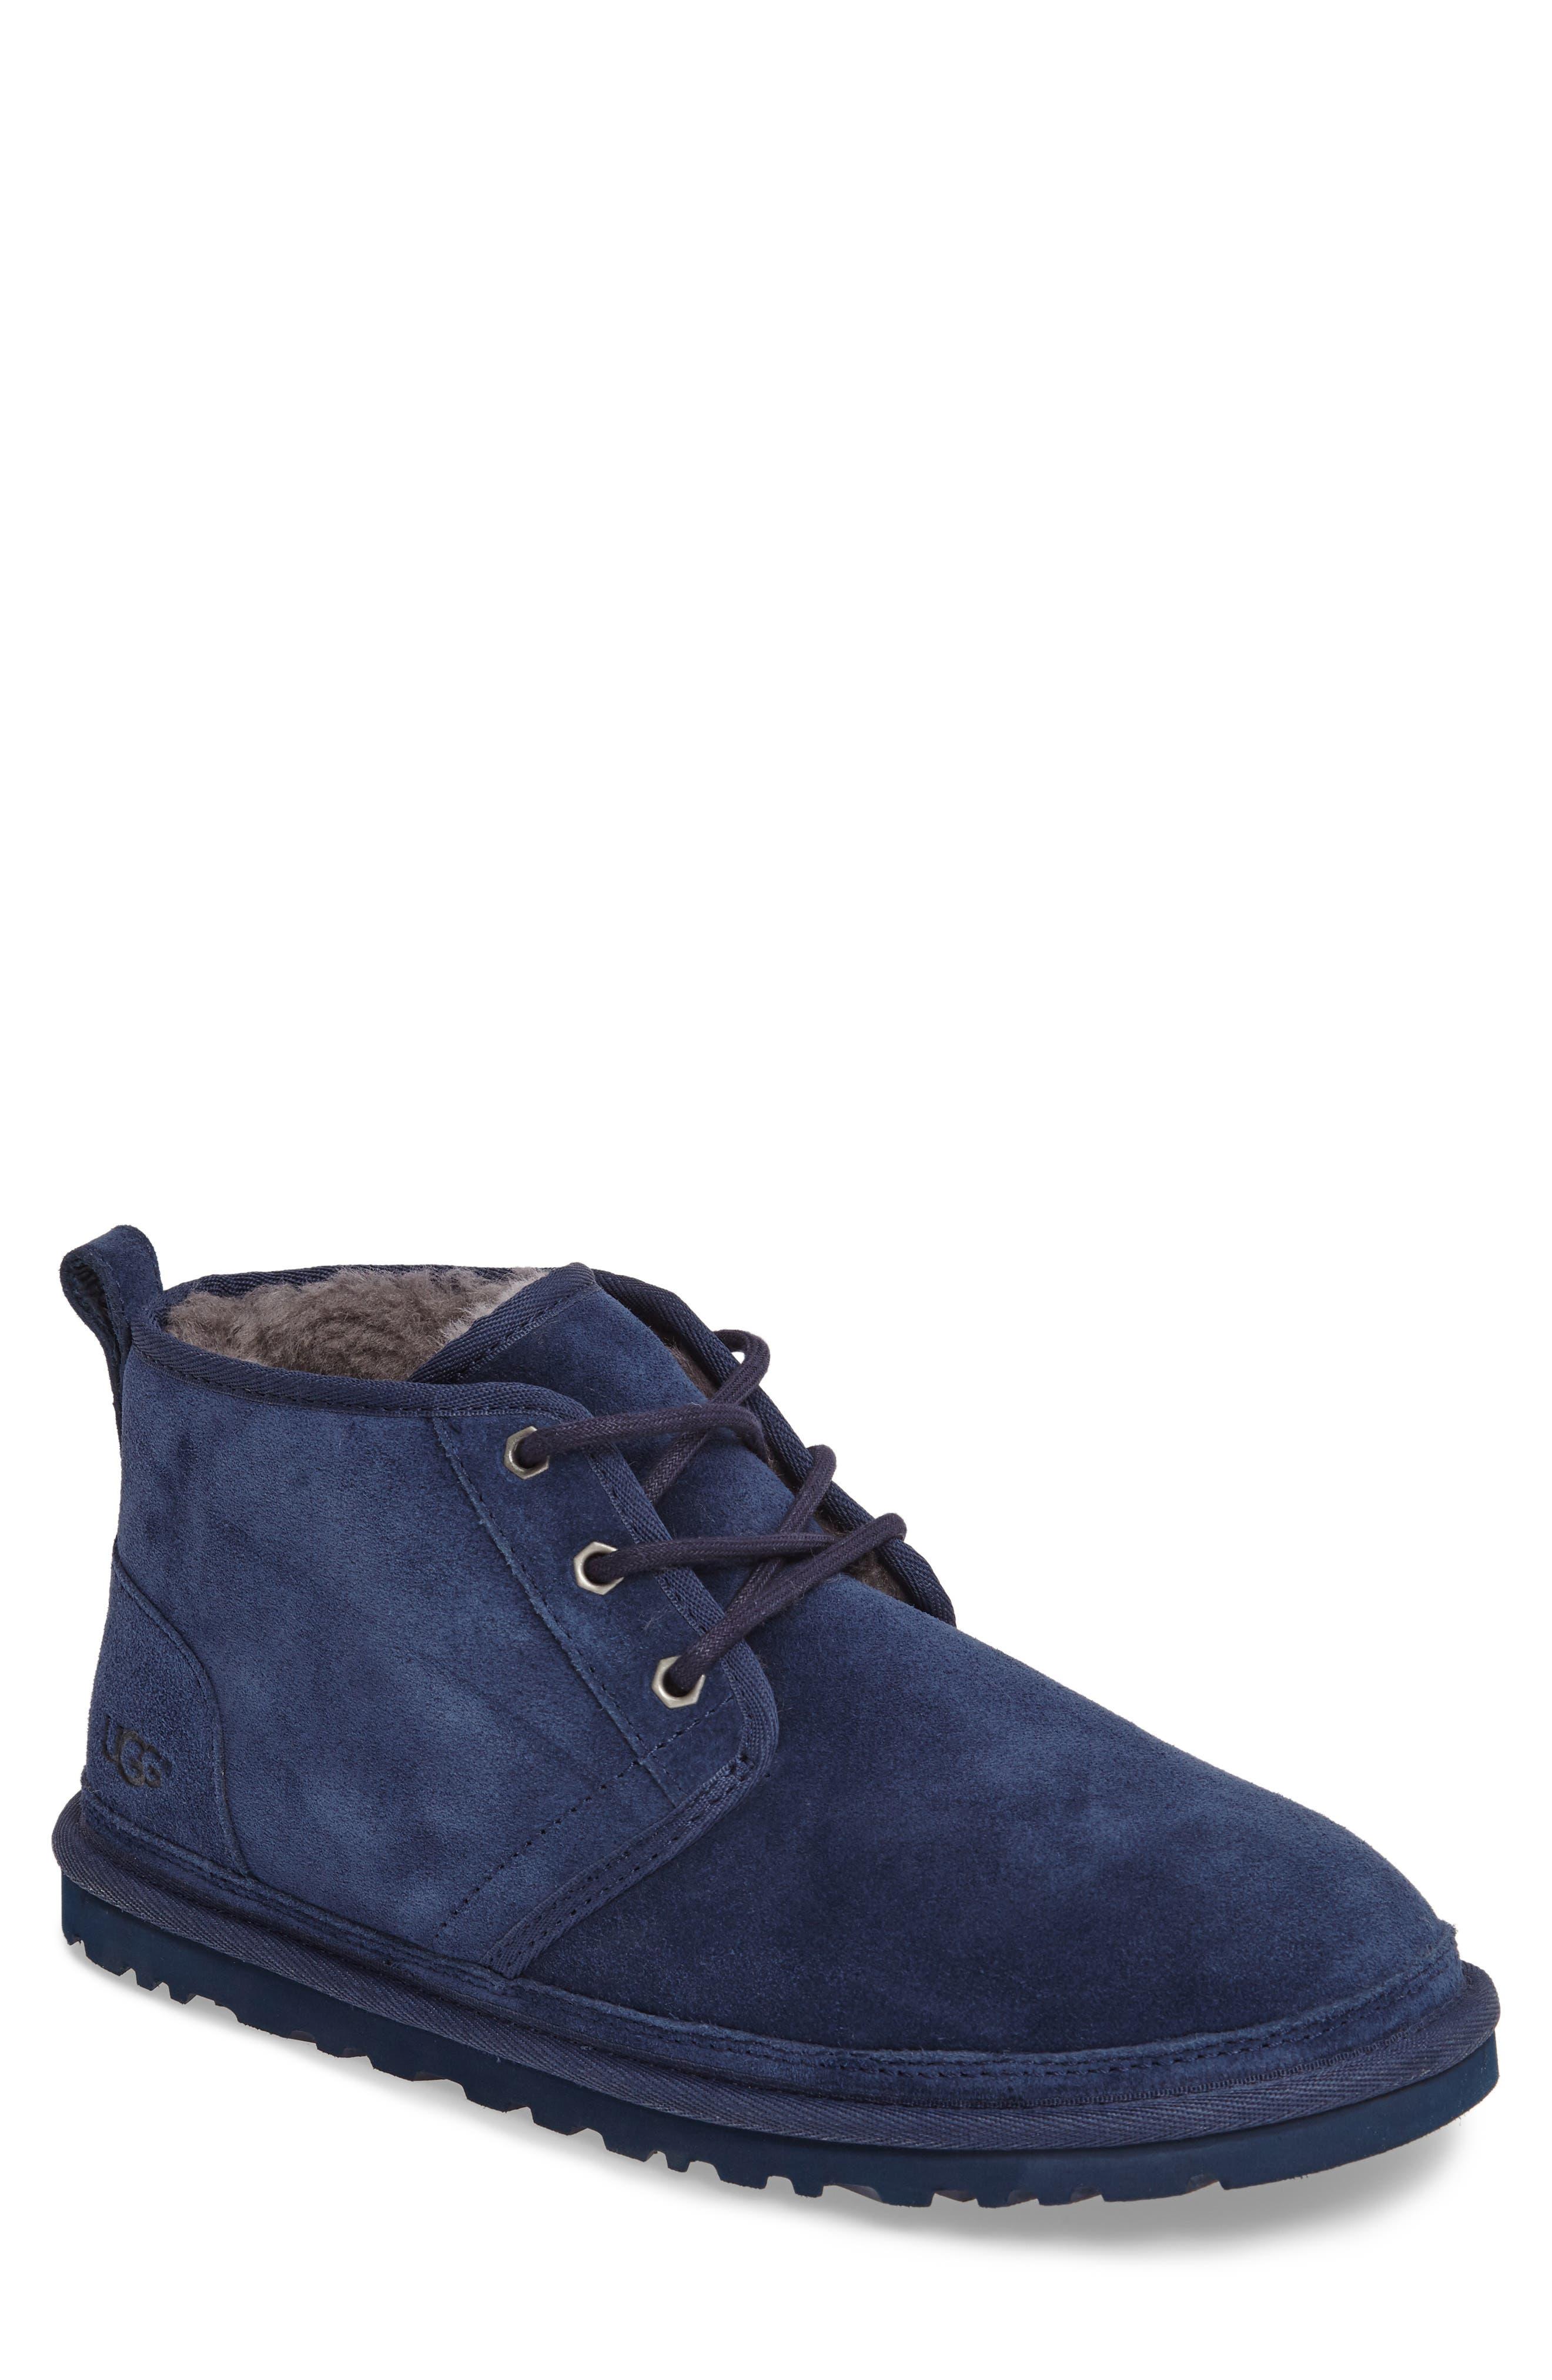 Ugg Neumel Chukka Boot, Blue